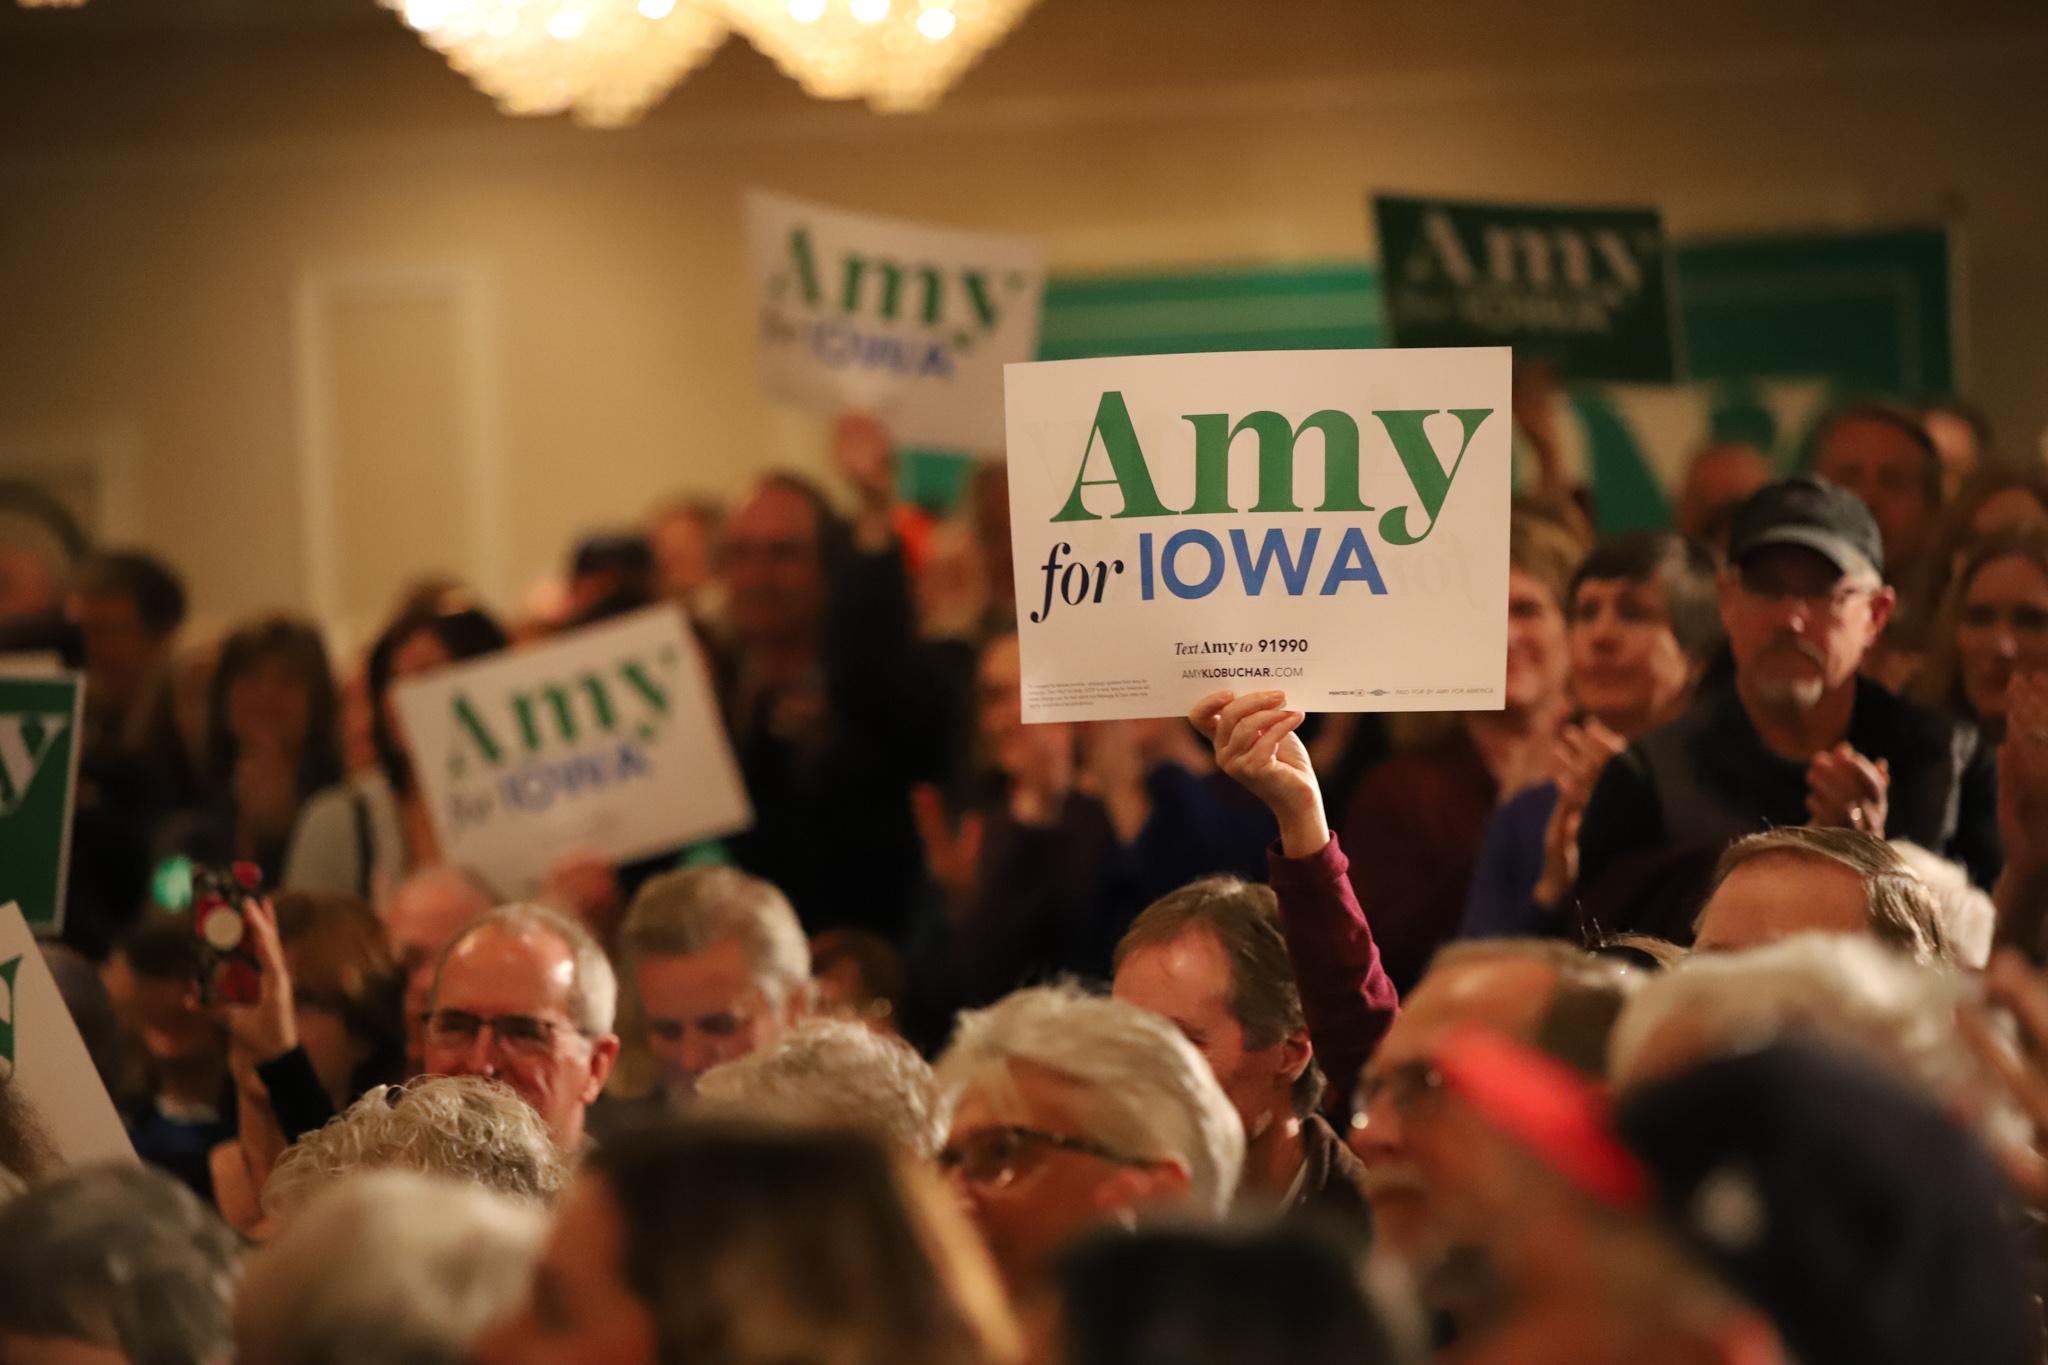 Voters at Klobuchar's rally. (Patsy Newitt, 14 East)